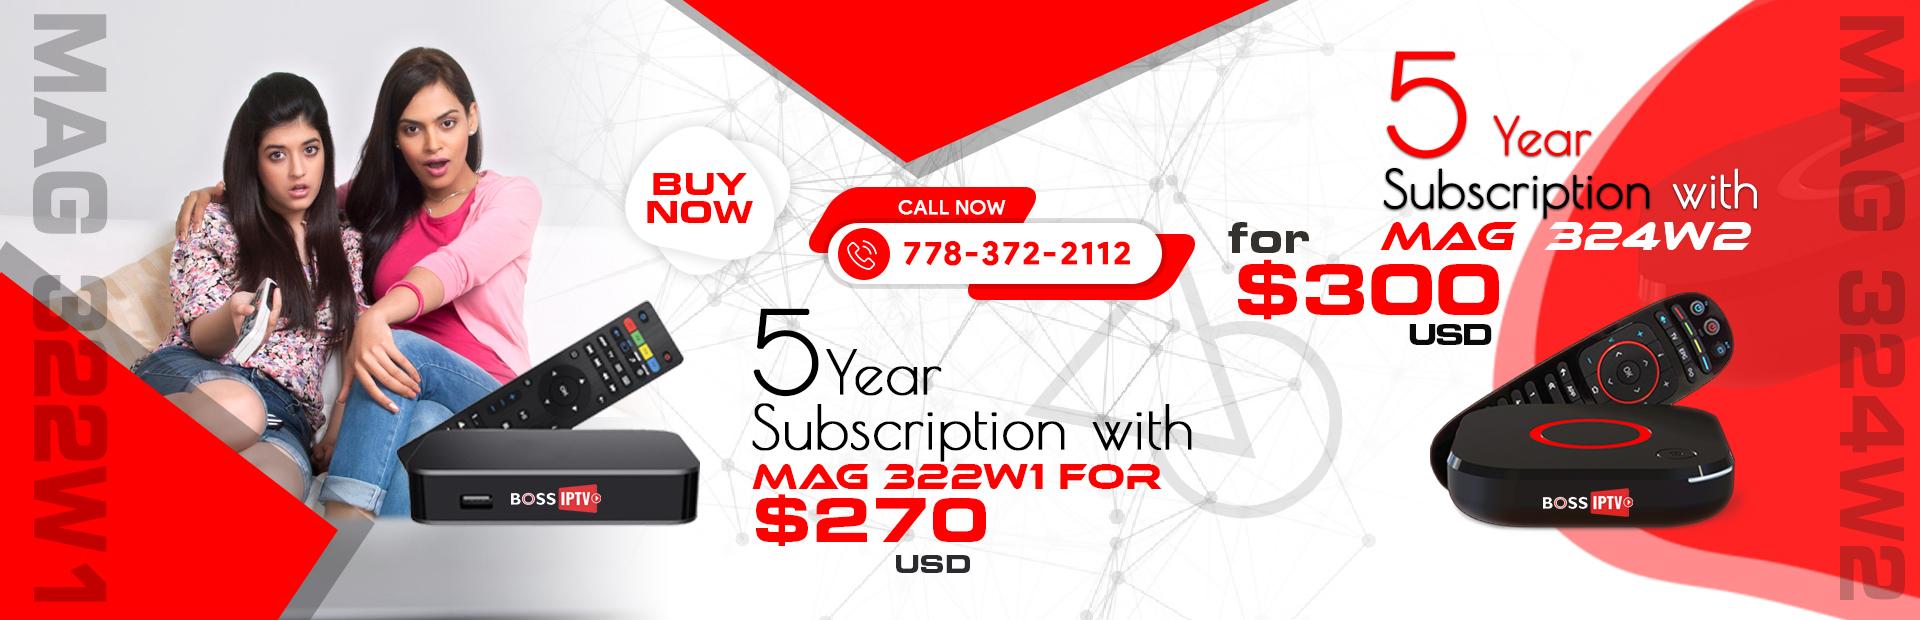 Mag 322w1 iptv box, Mag 324w2 iptv box